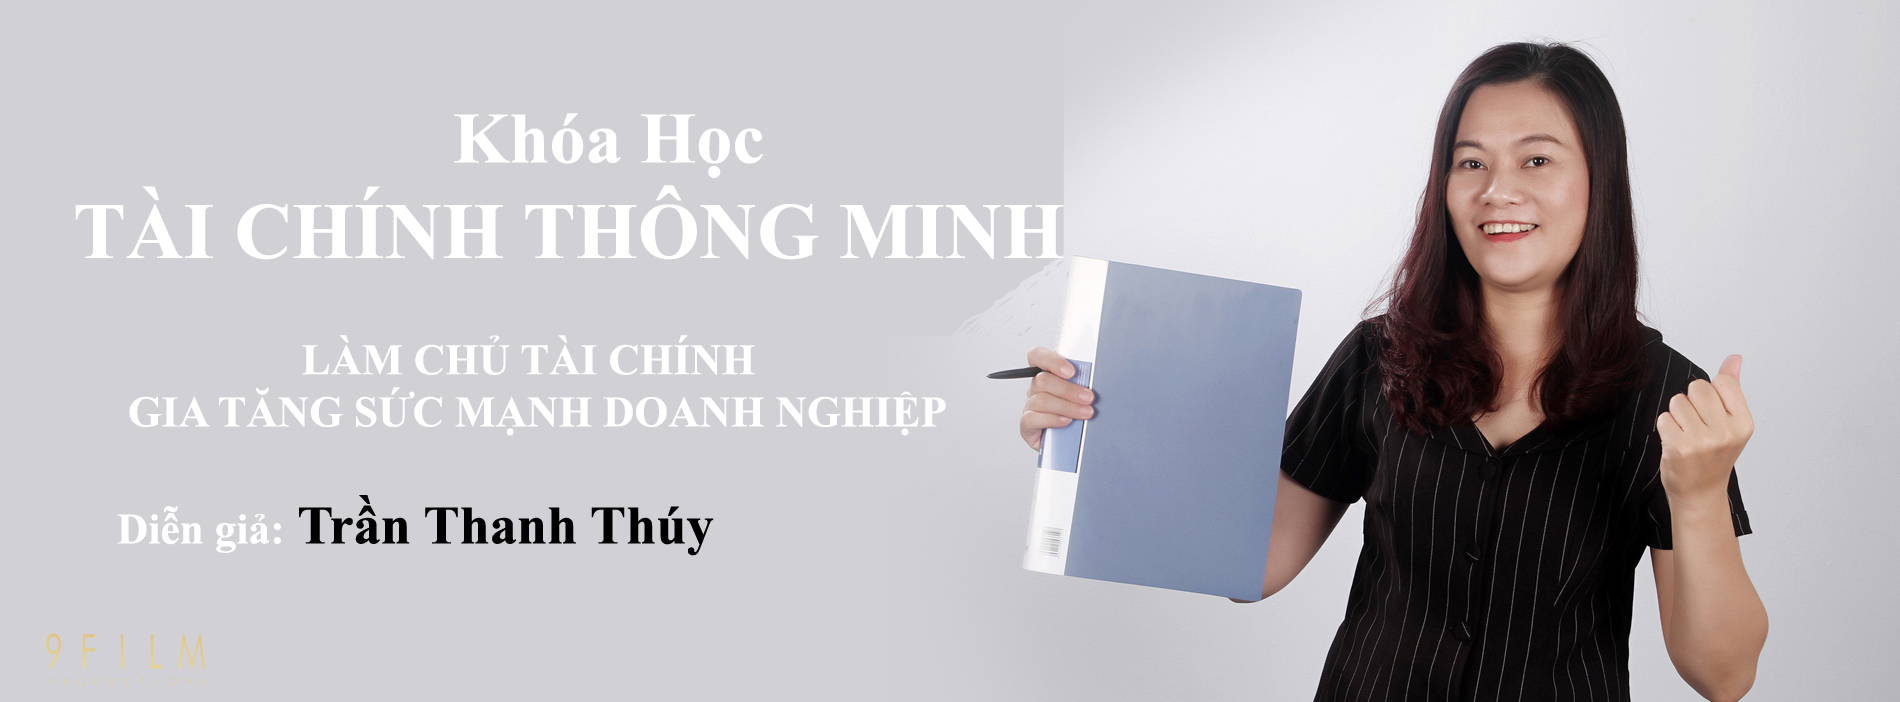 TAI-CHINH-THONG-MINH